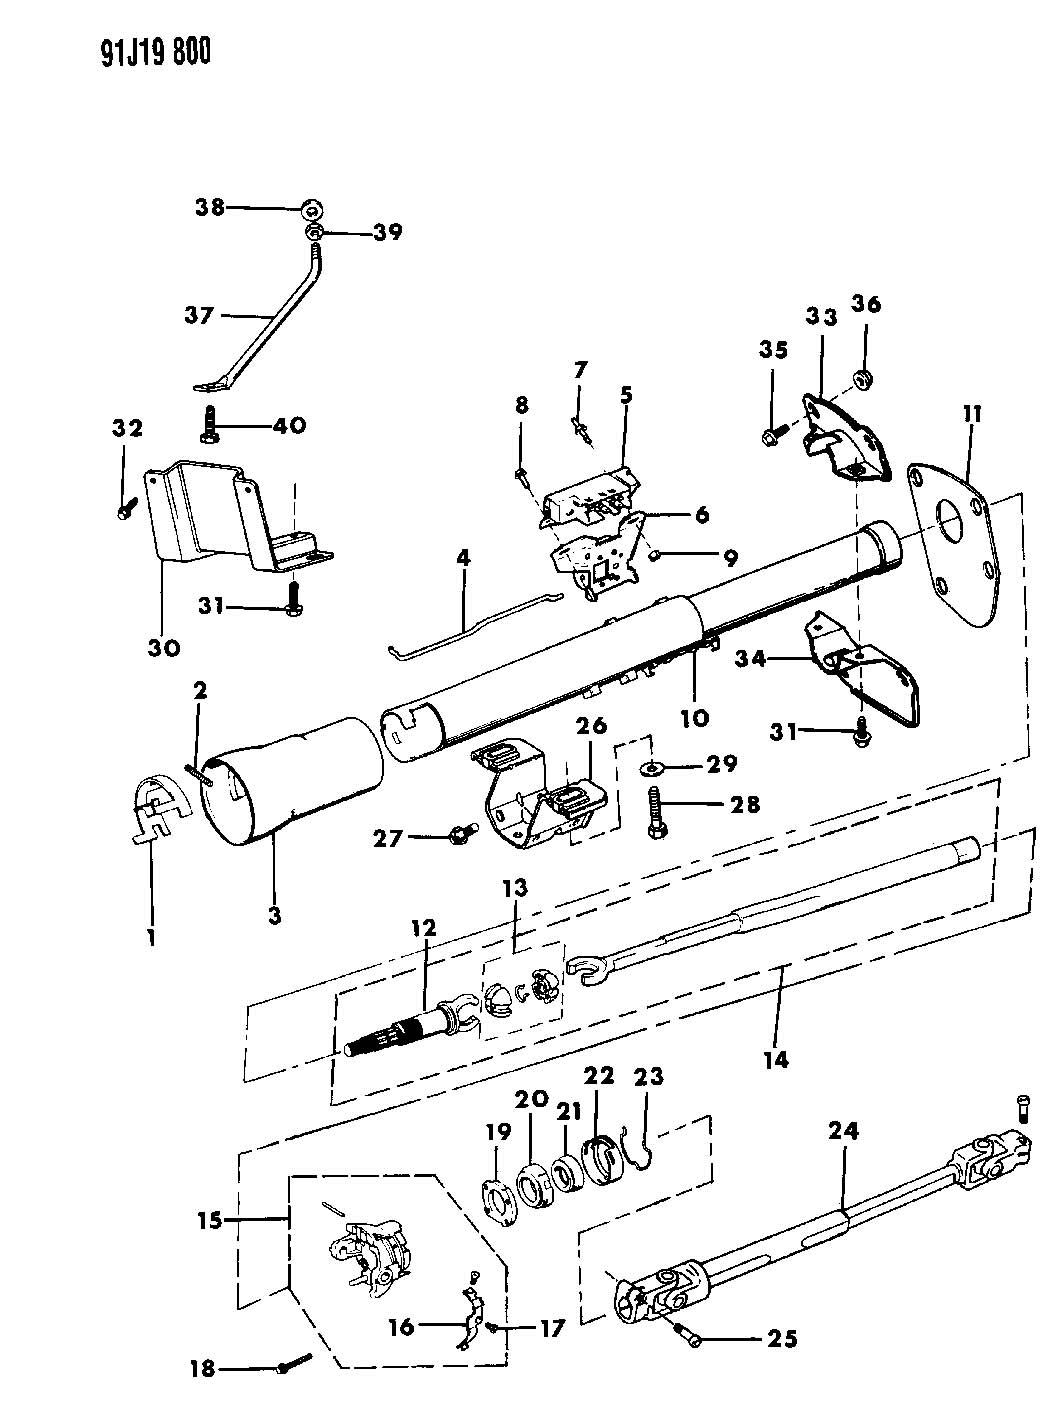 1994 Jeep Wrangler Yj Steering Column Parts